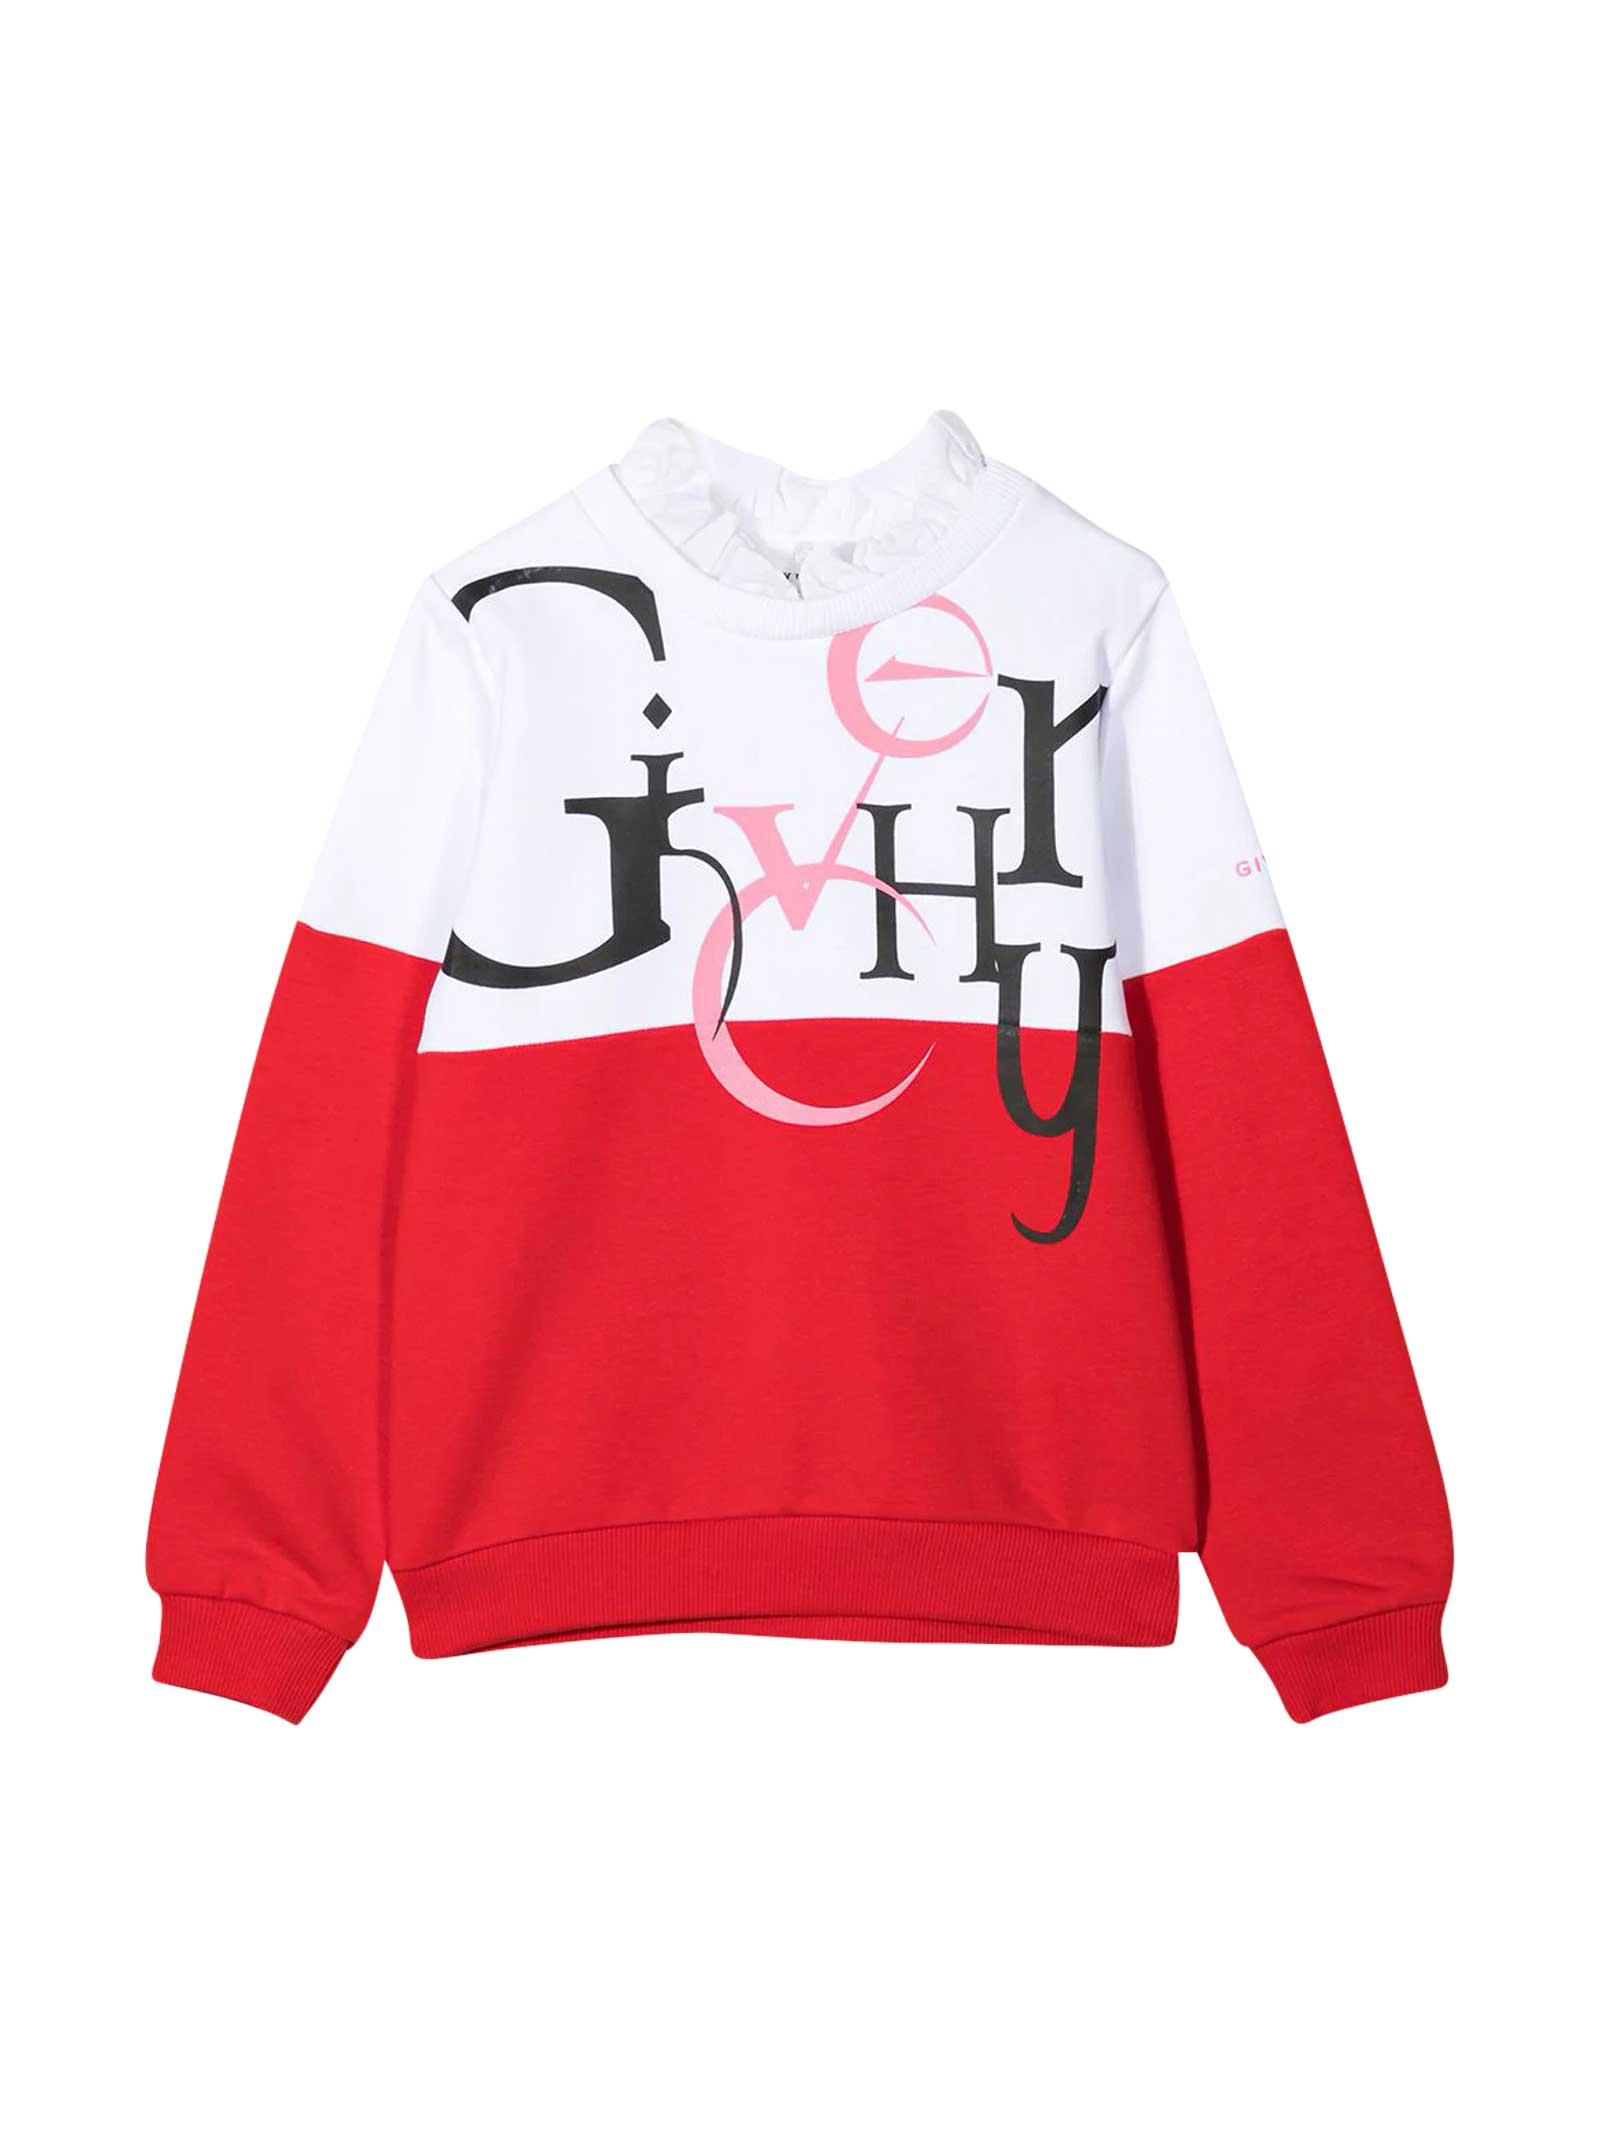 Givenchy Shirts TEEN TWO-TONE SWEATSHIRT